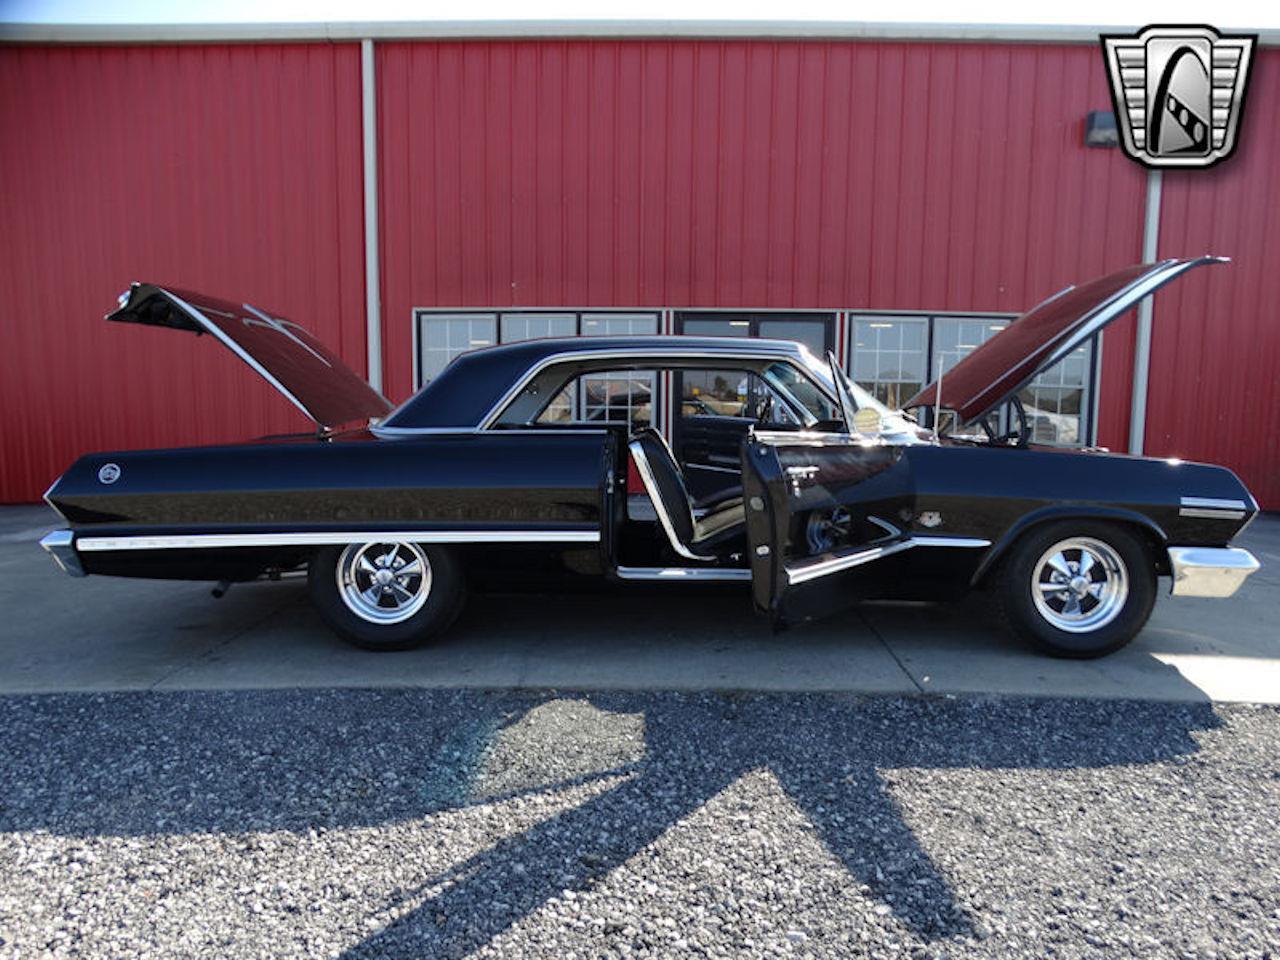 1963 Chevrolet Impala (CC-1341802) for sale in O'Fallon, Illinois